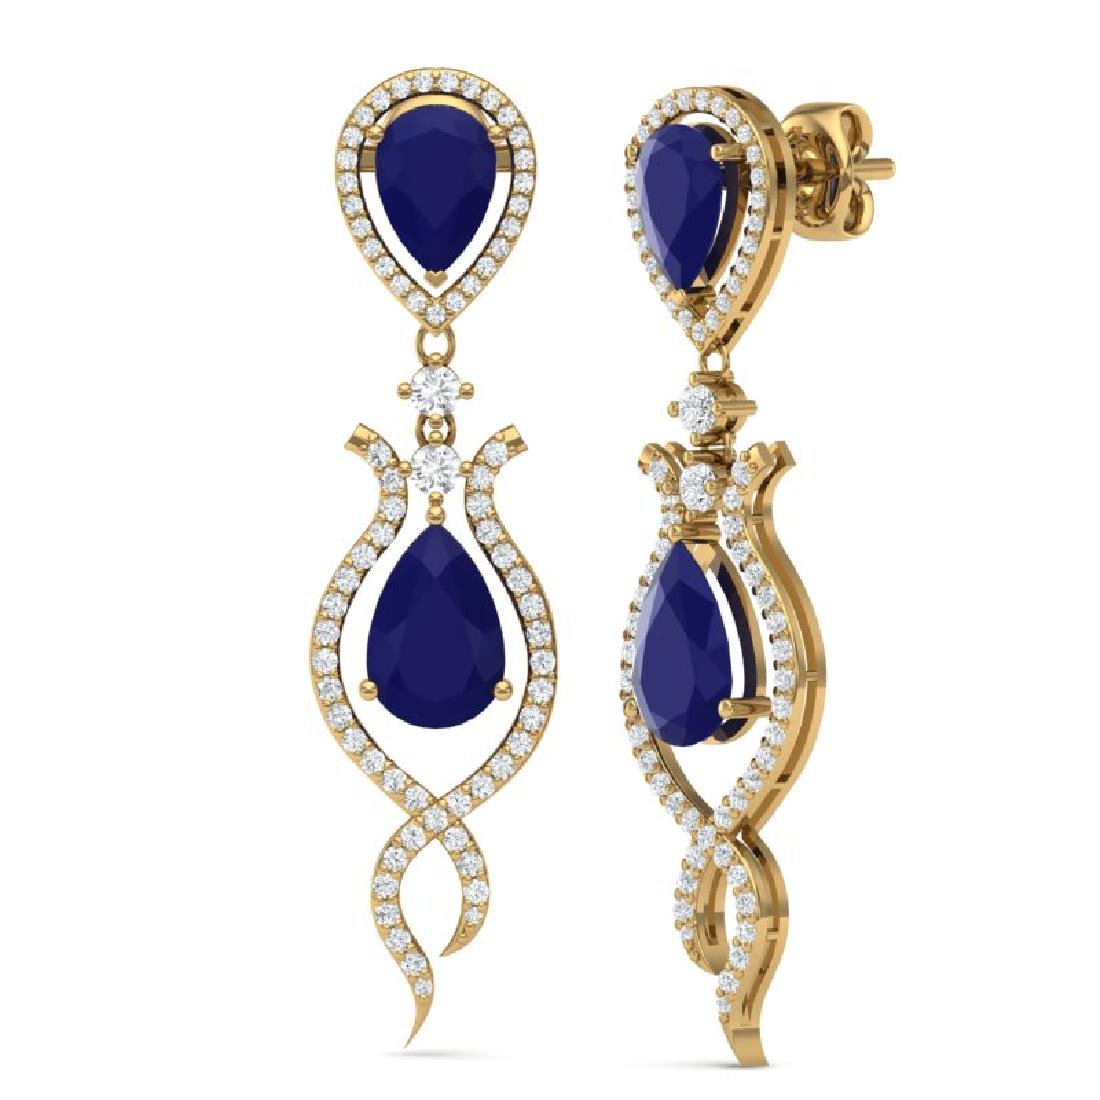 16.57 CTW Royalty Sapphire & VS Diamond Earrings 18K - 3